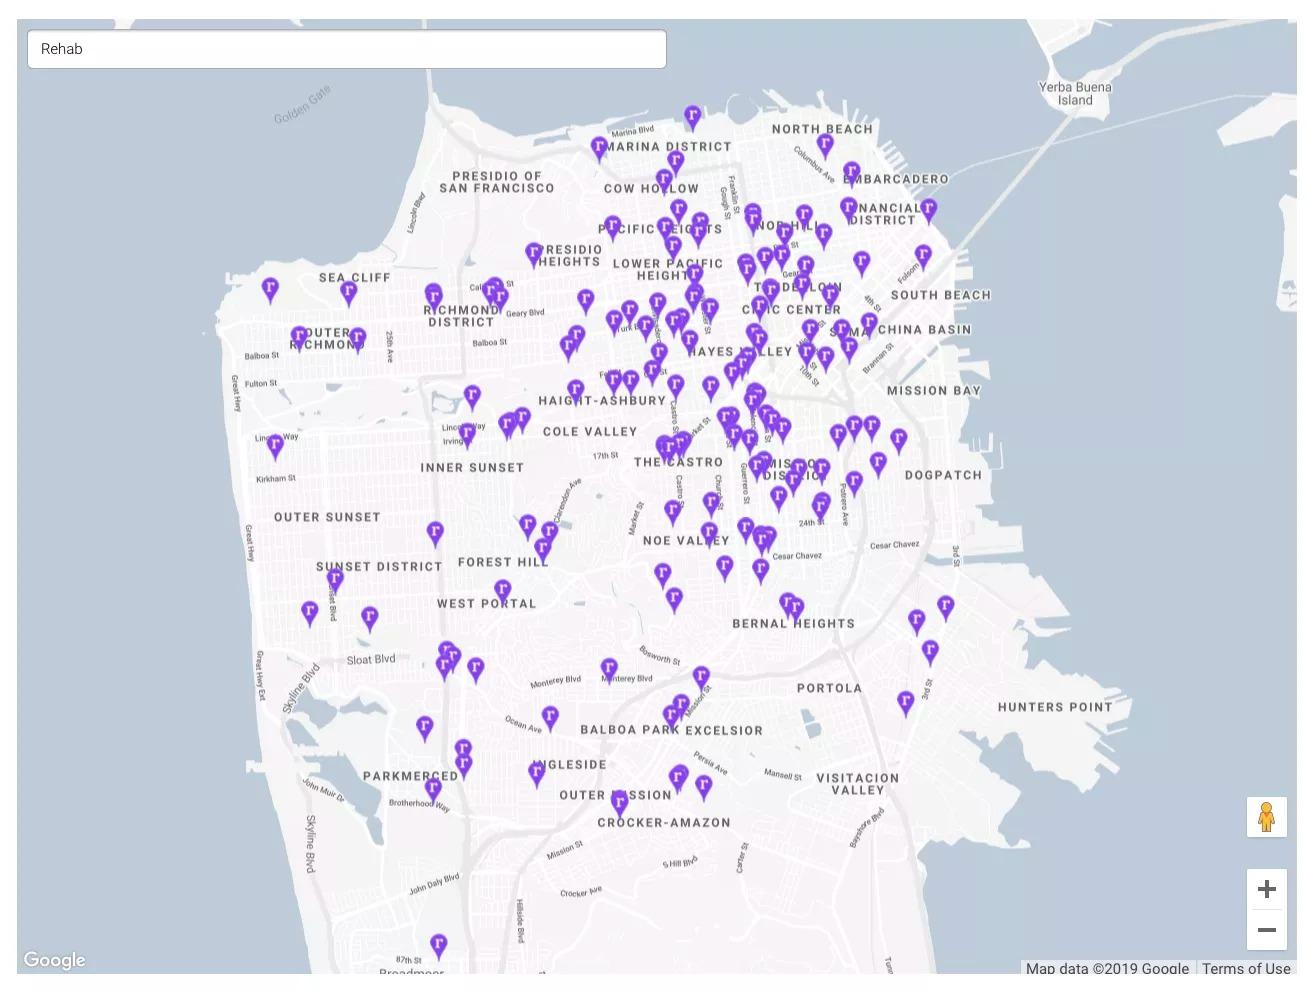 rehab google maps